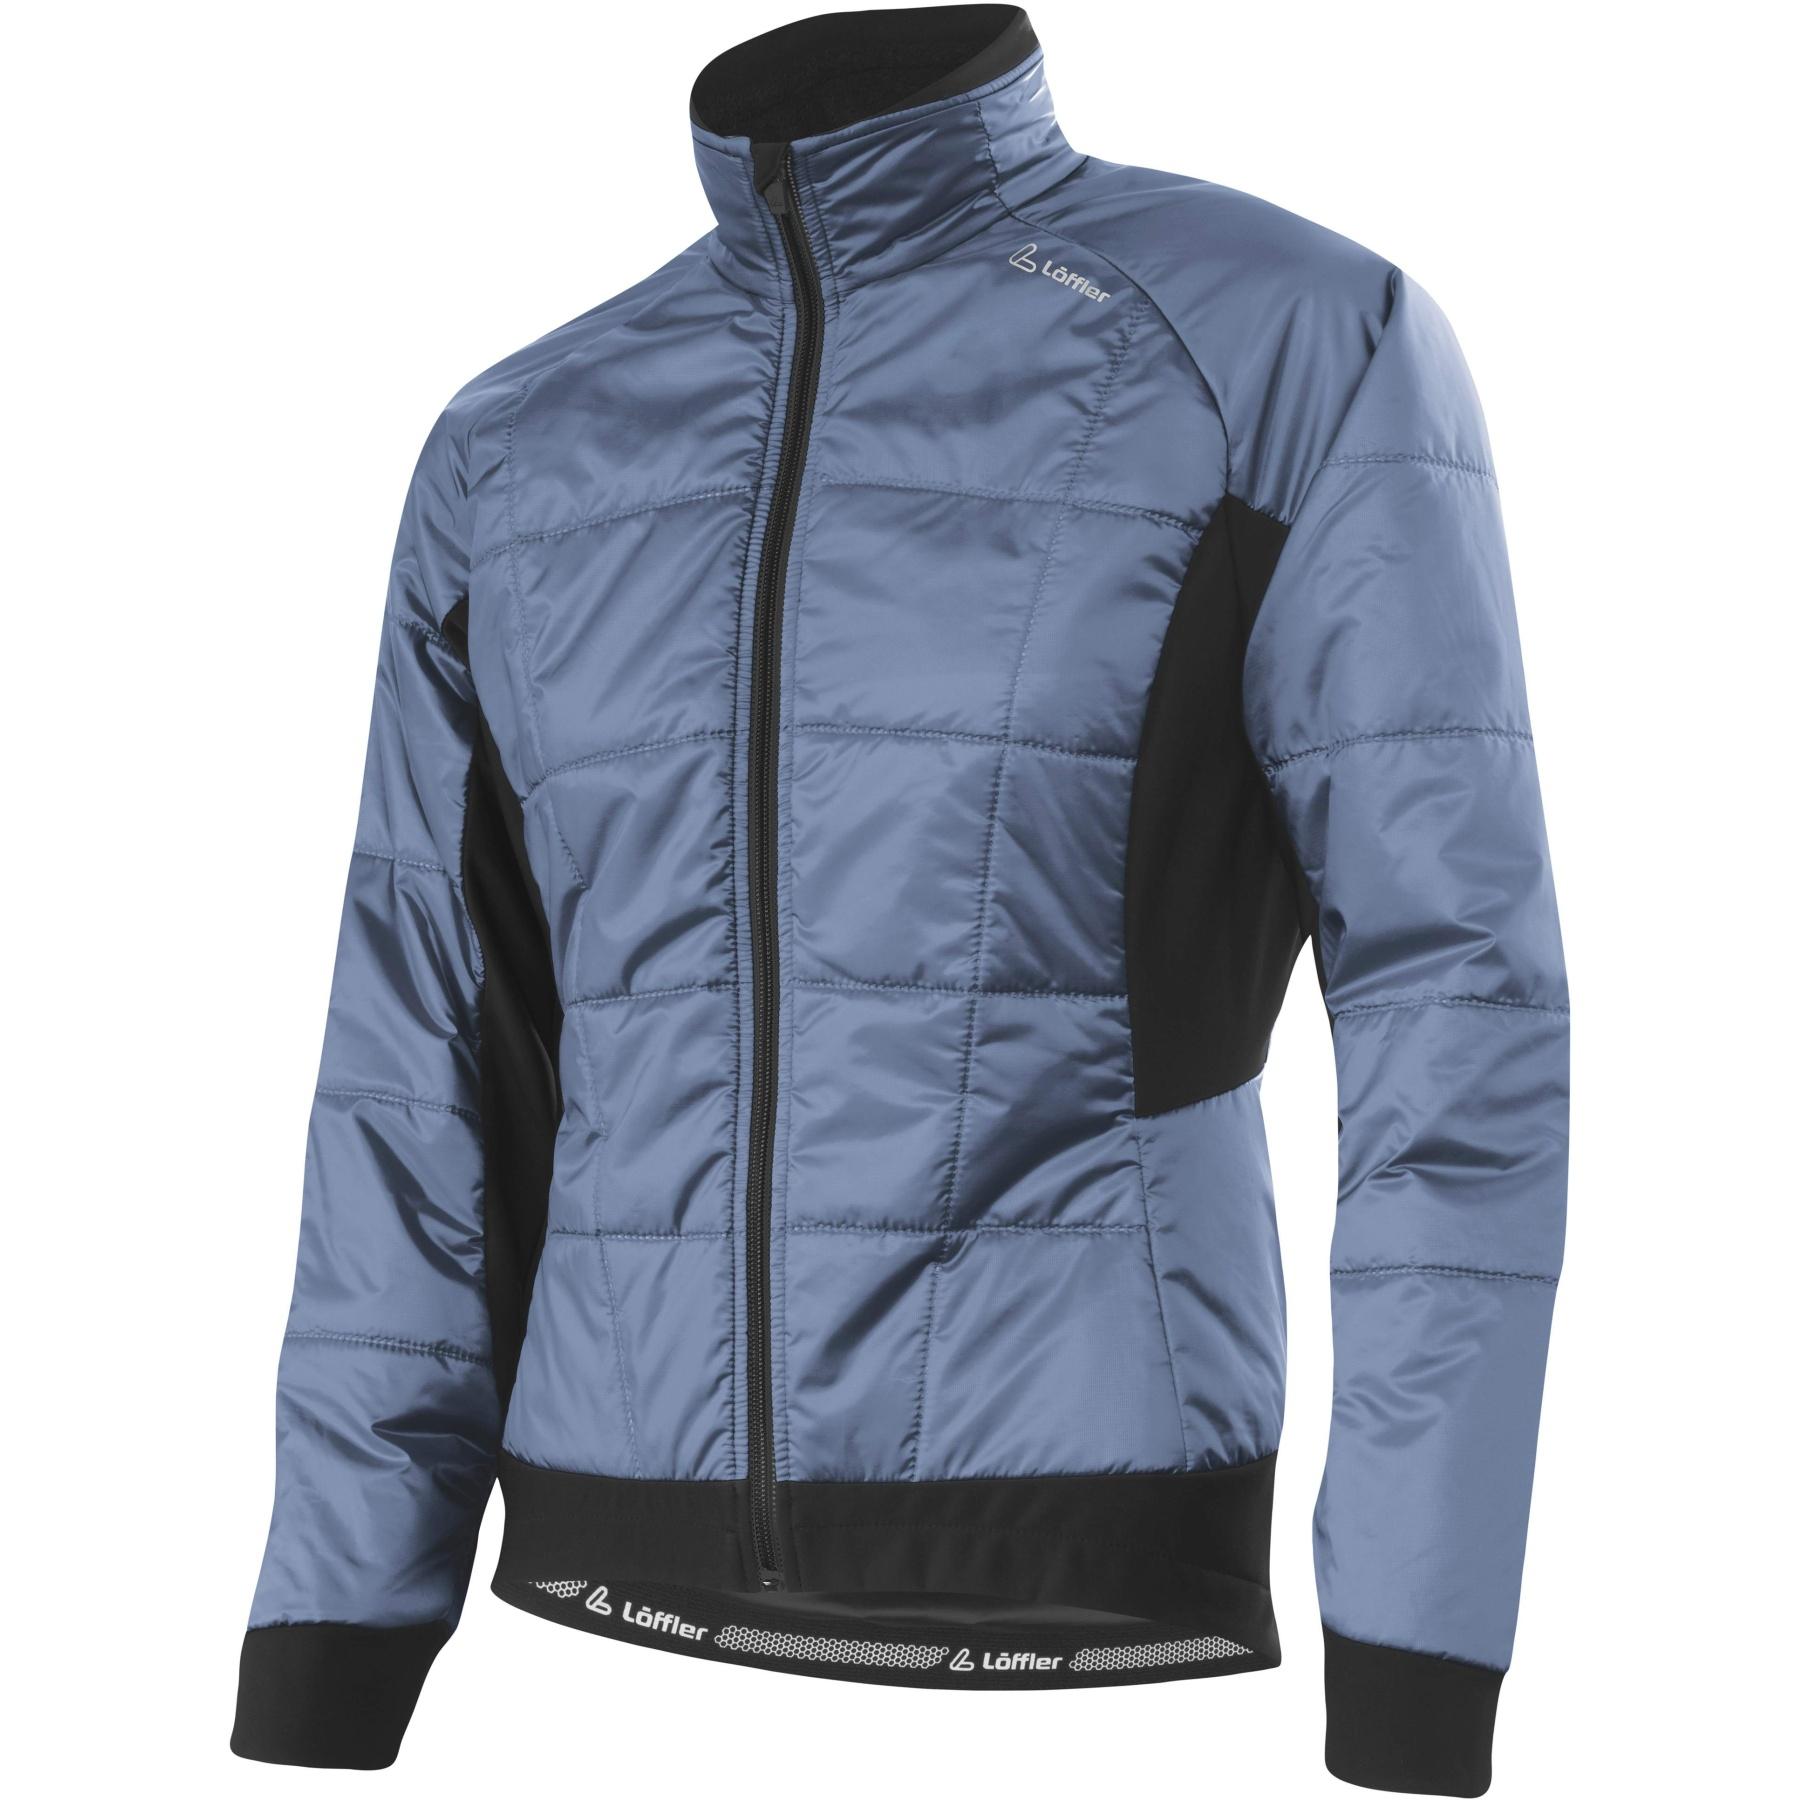 Löffler Bike Iso Jacke Hotbond® PL60 Damen 20603 - enzian 461